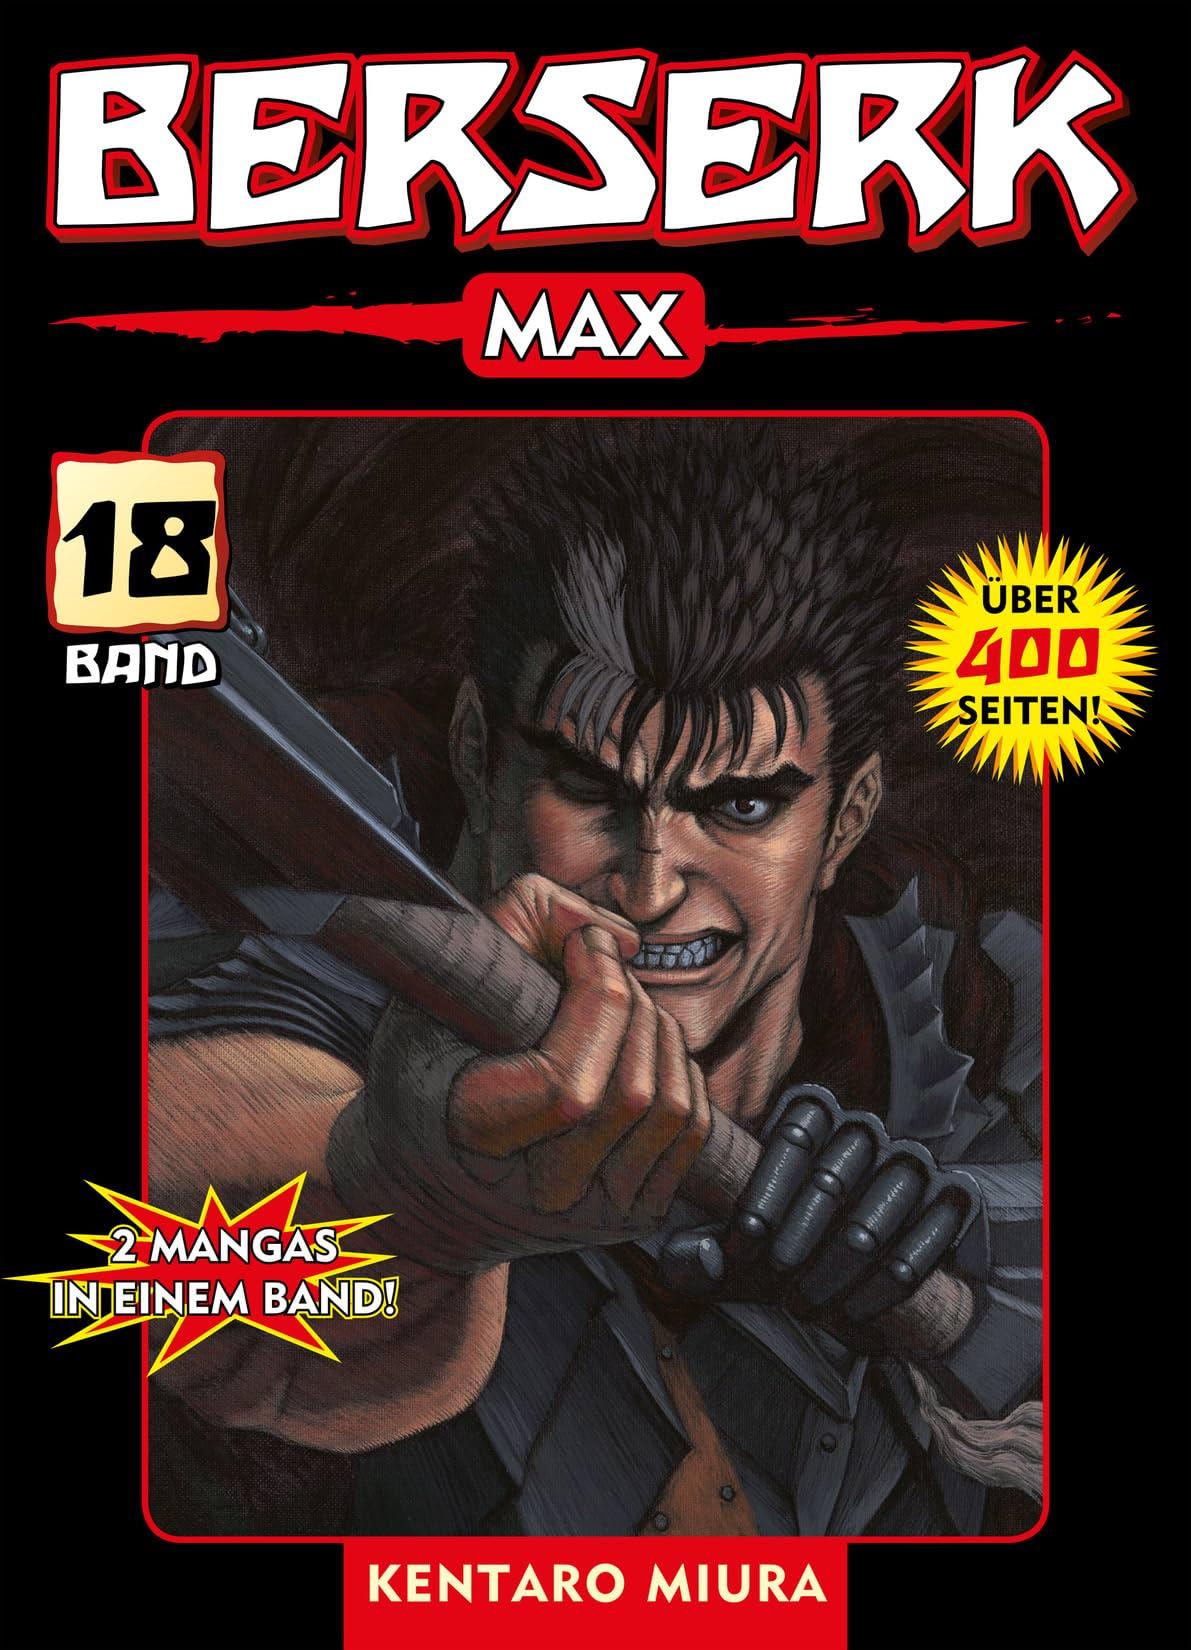 Berserk Max Vol. 18